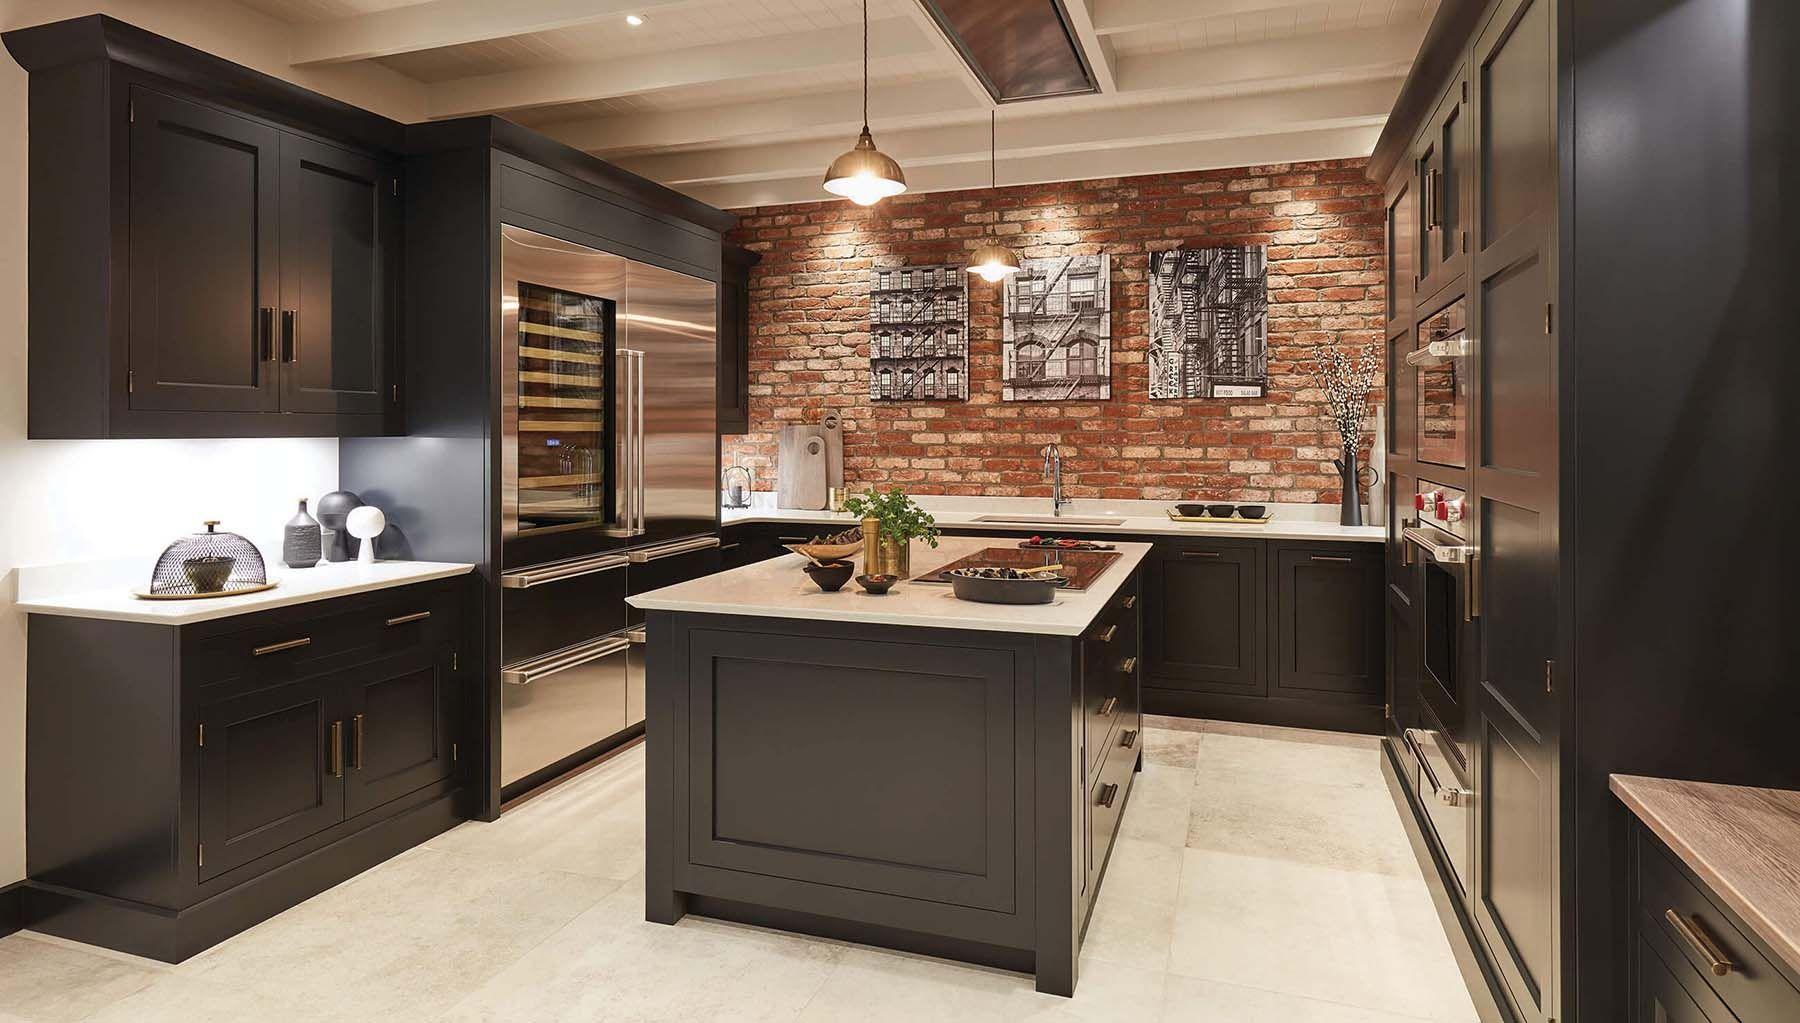 Red Brick In The Kitchen In 2020 Exposed Brick Kitchen Brick